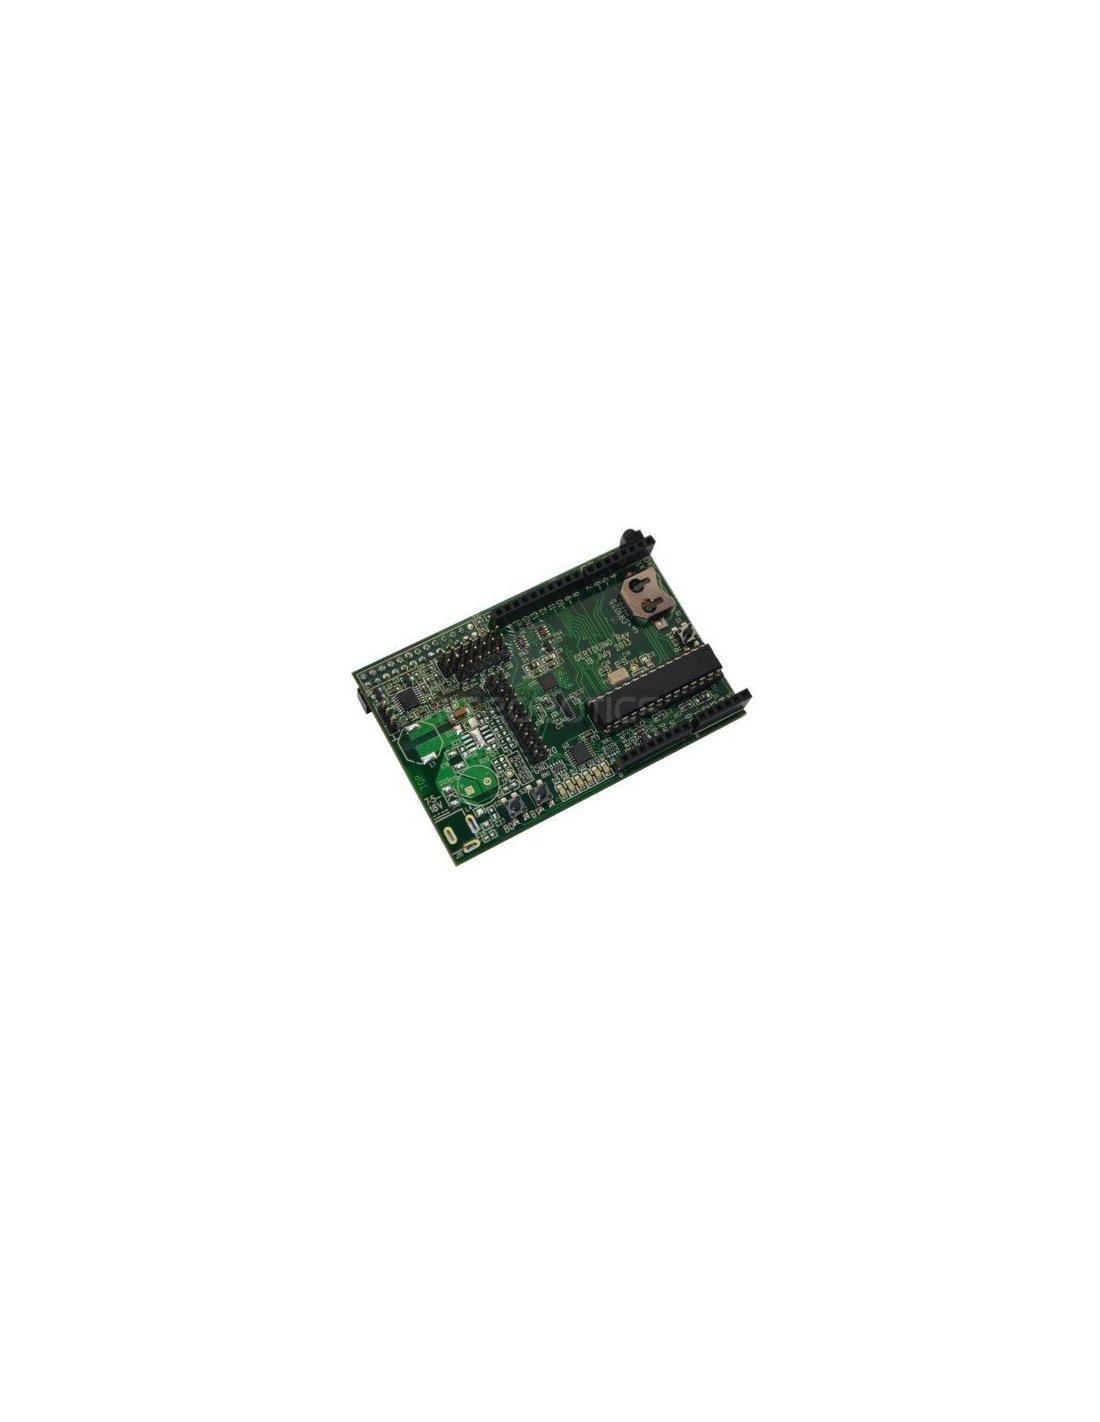 Gertduino arduino add on board for raspberry pi